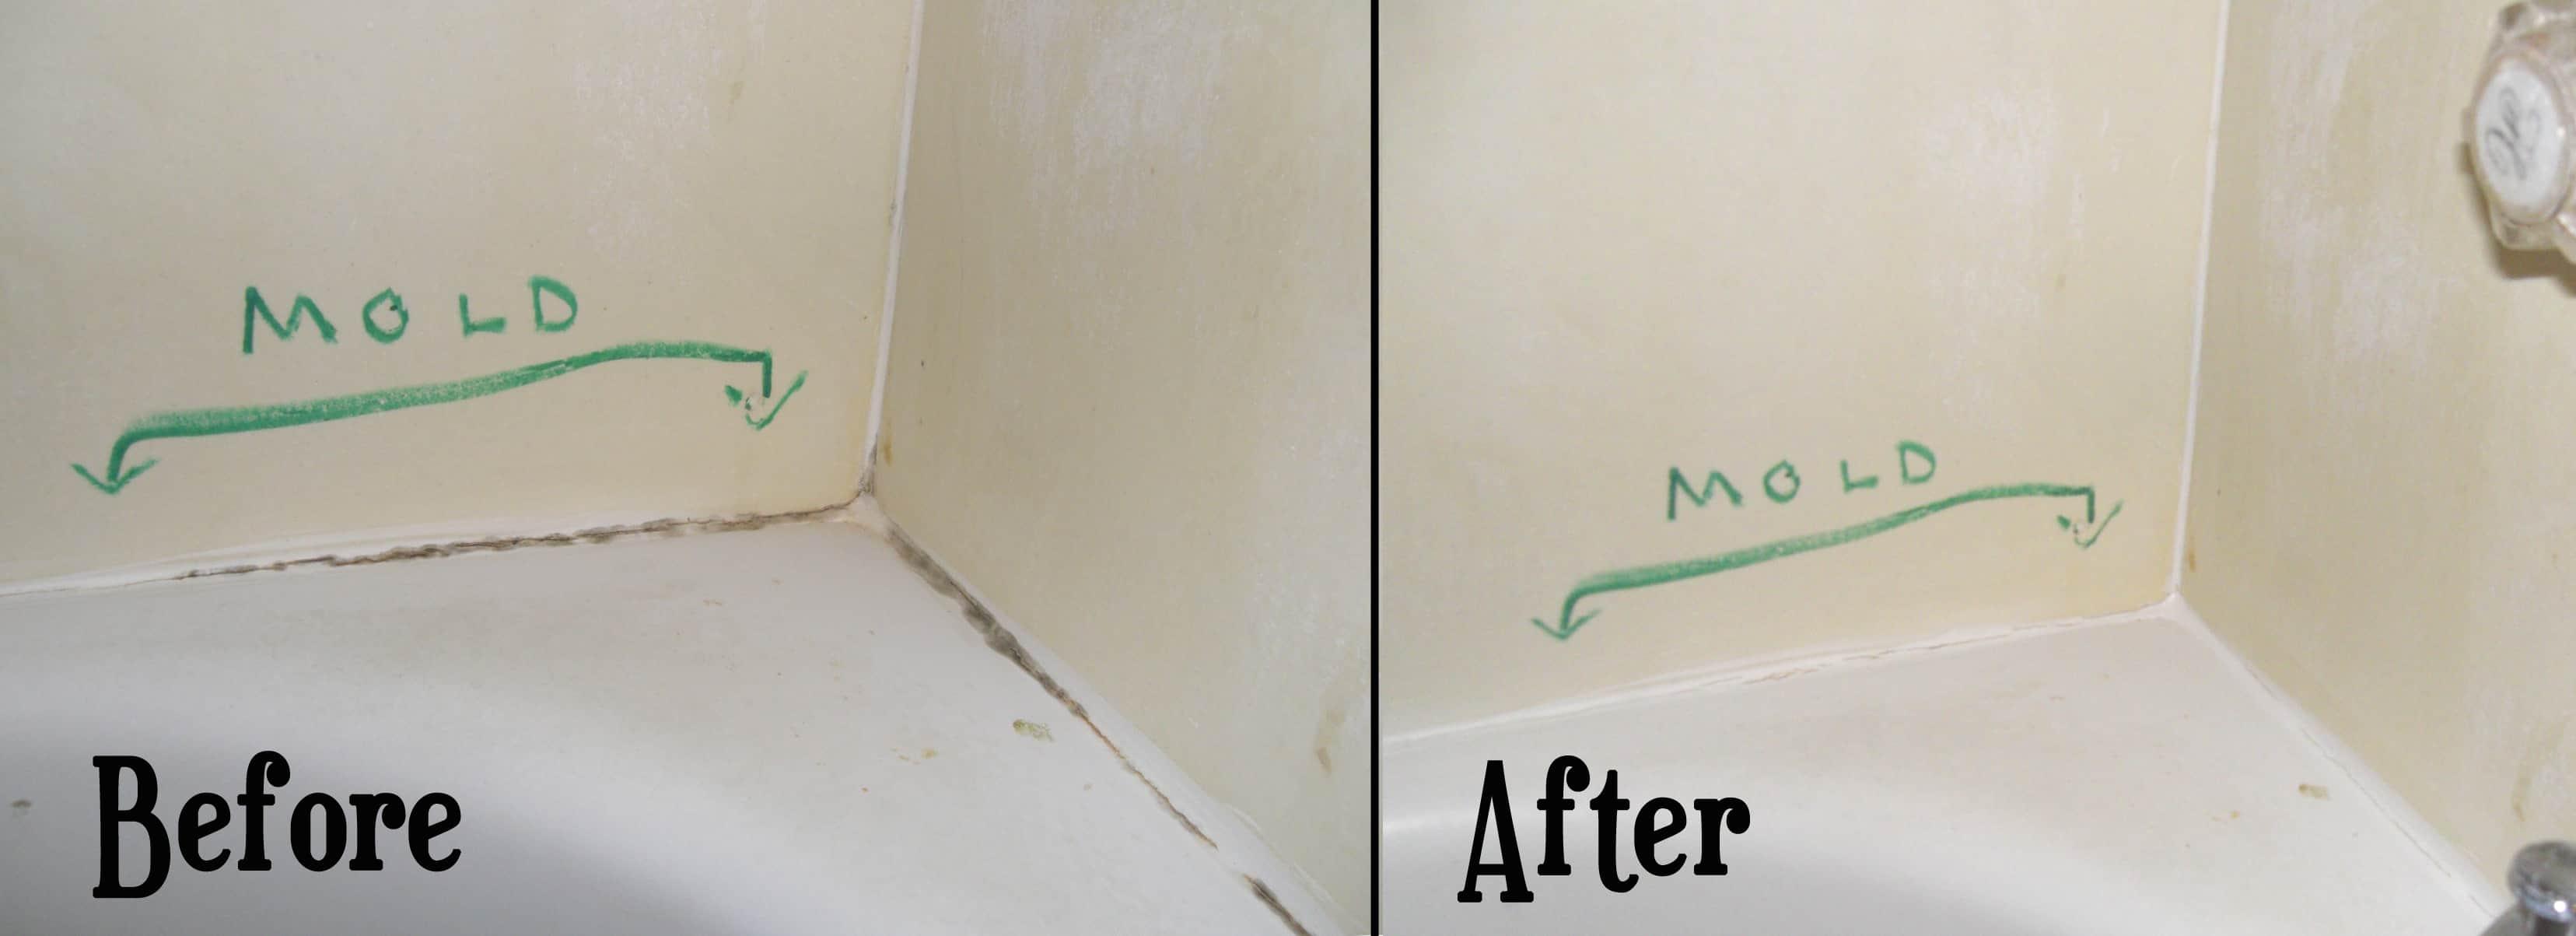 Bathroom cleaning mold